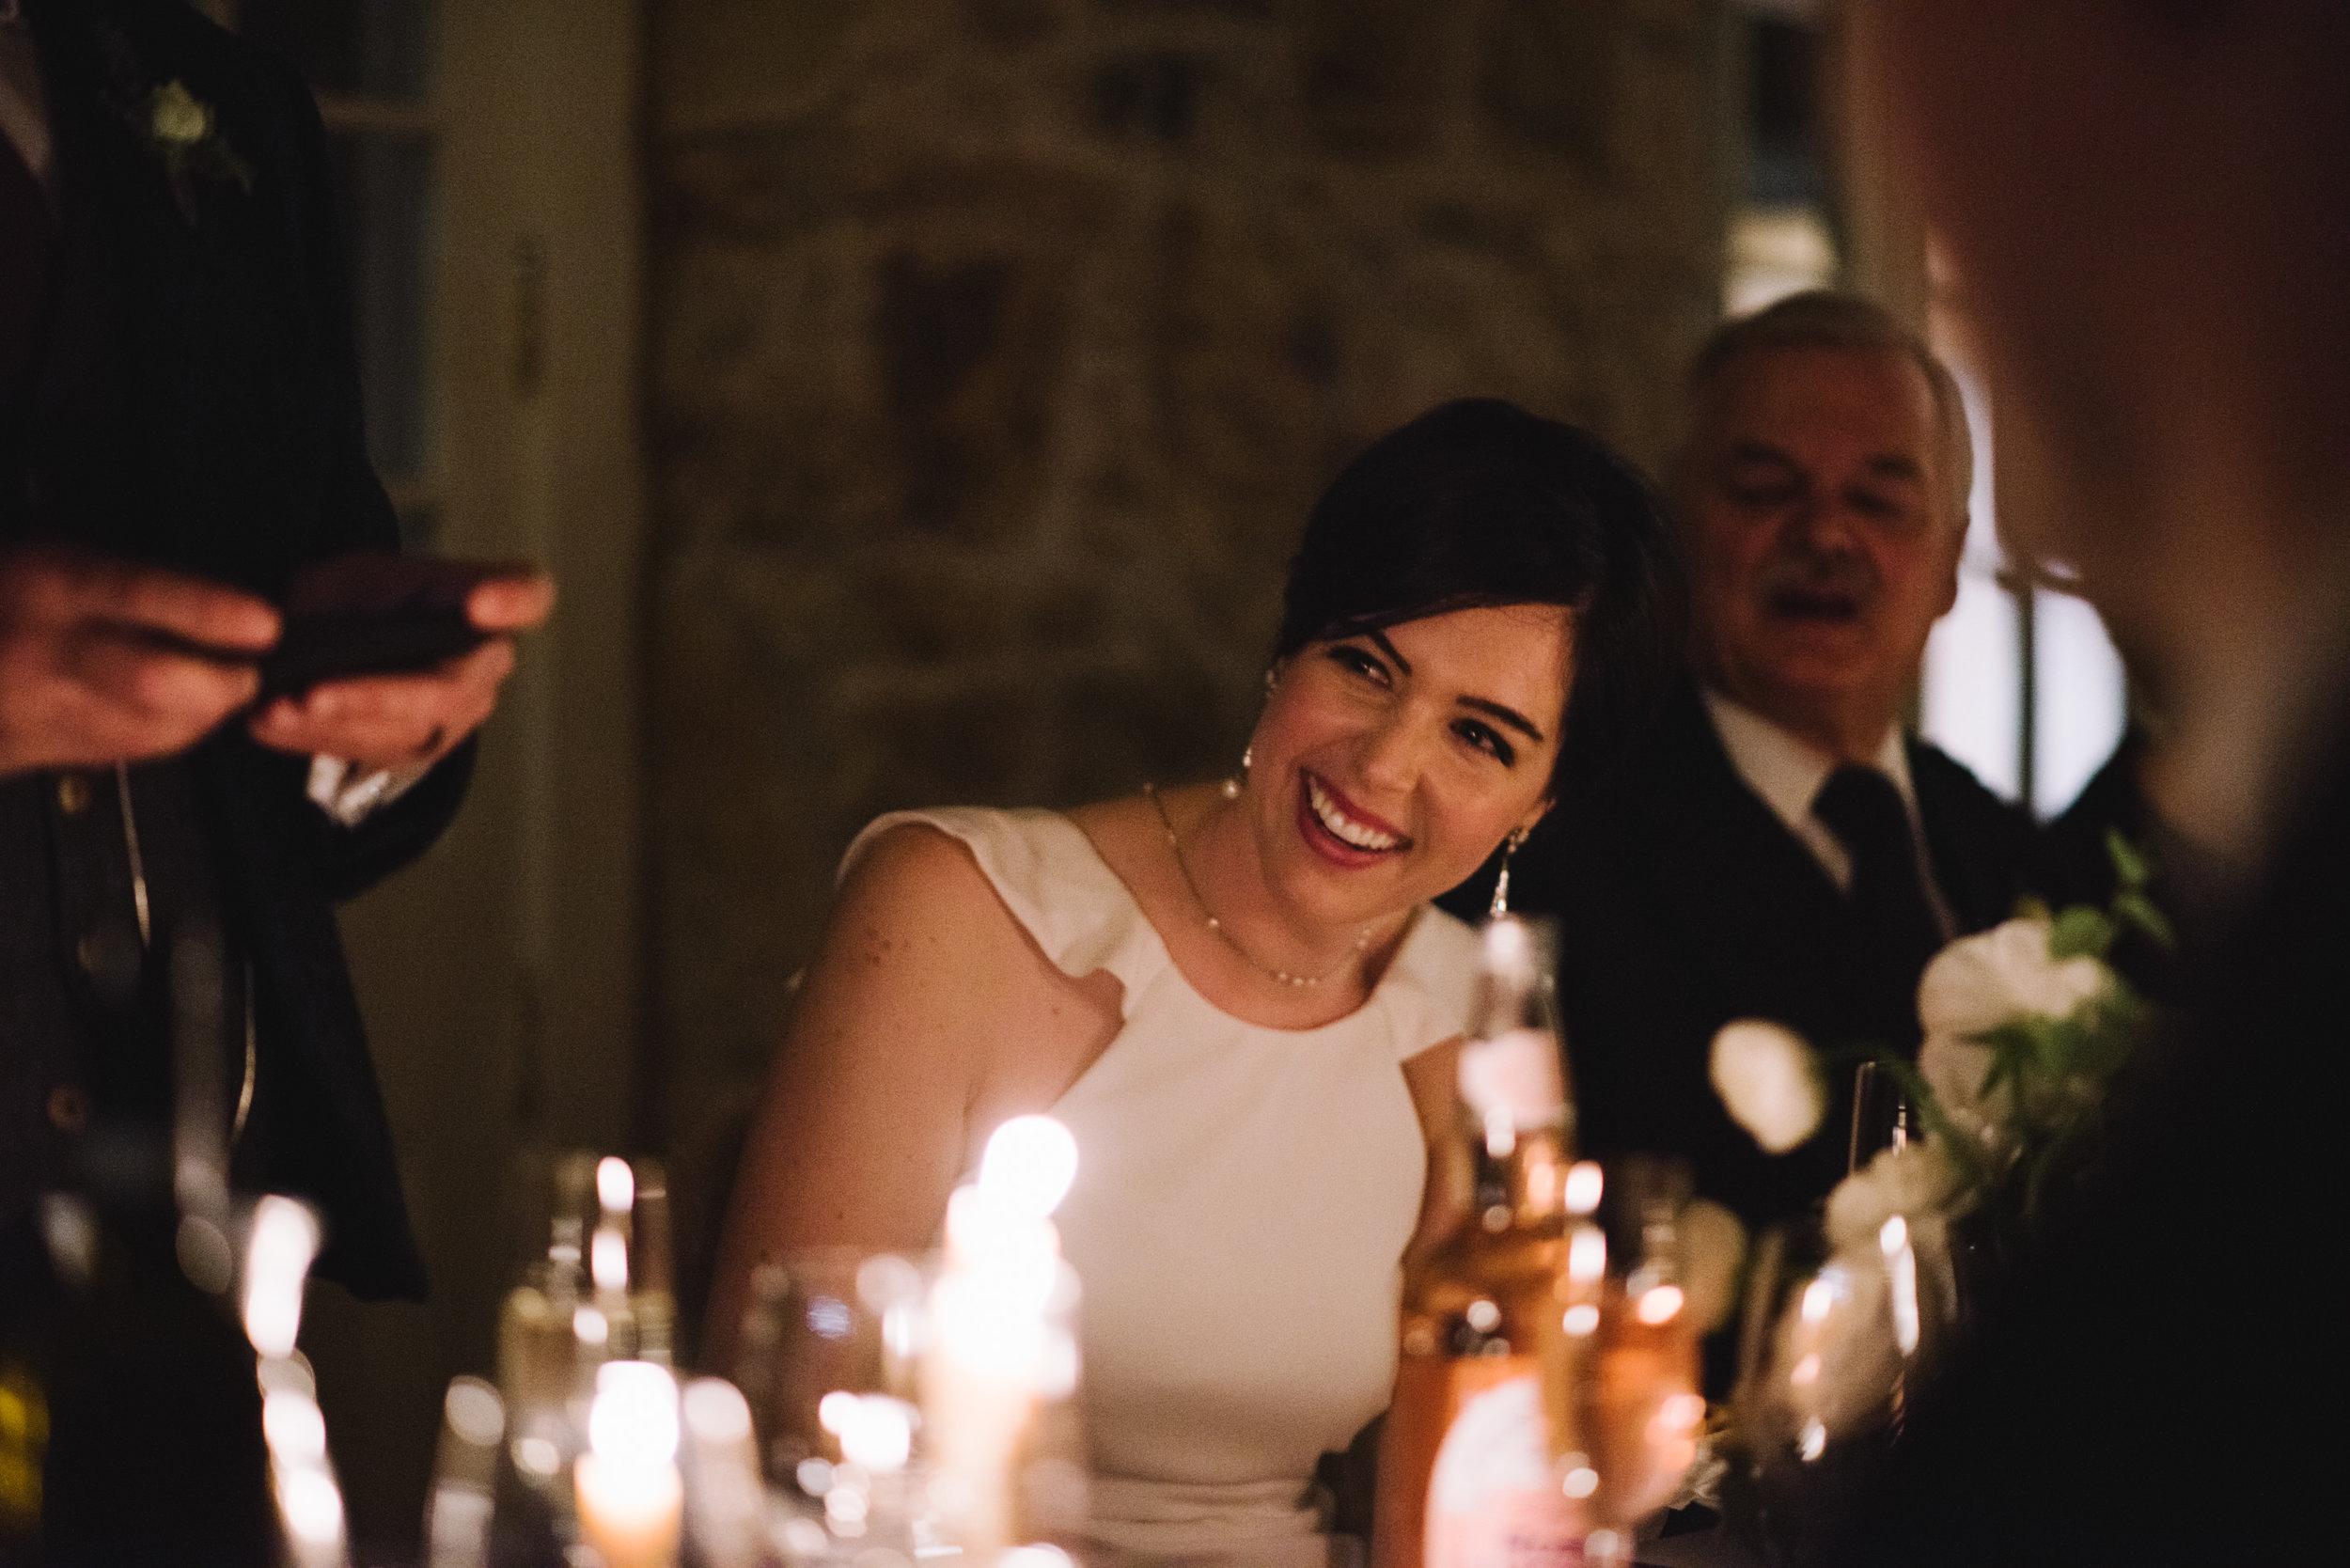 0236-LISA-DEVINE-PHOTOGRAPHY-ALTERNATIVE-WEDDING-PHOTOGRAPHY-SCOTLAND-DESTINATION-WEDDINGS-GLASGOW-WEDDINGS-COOL-WEDDINGS-STYLISH-WEDDINGS.JPG